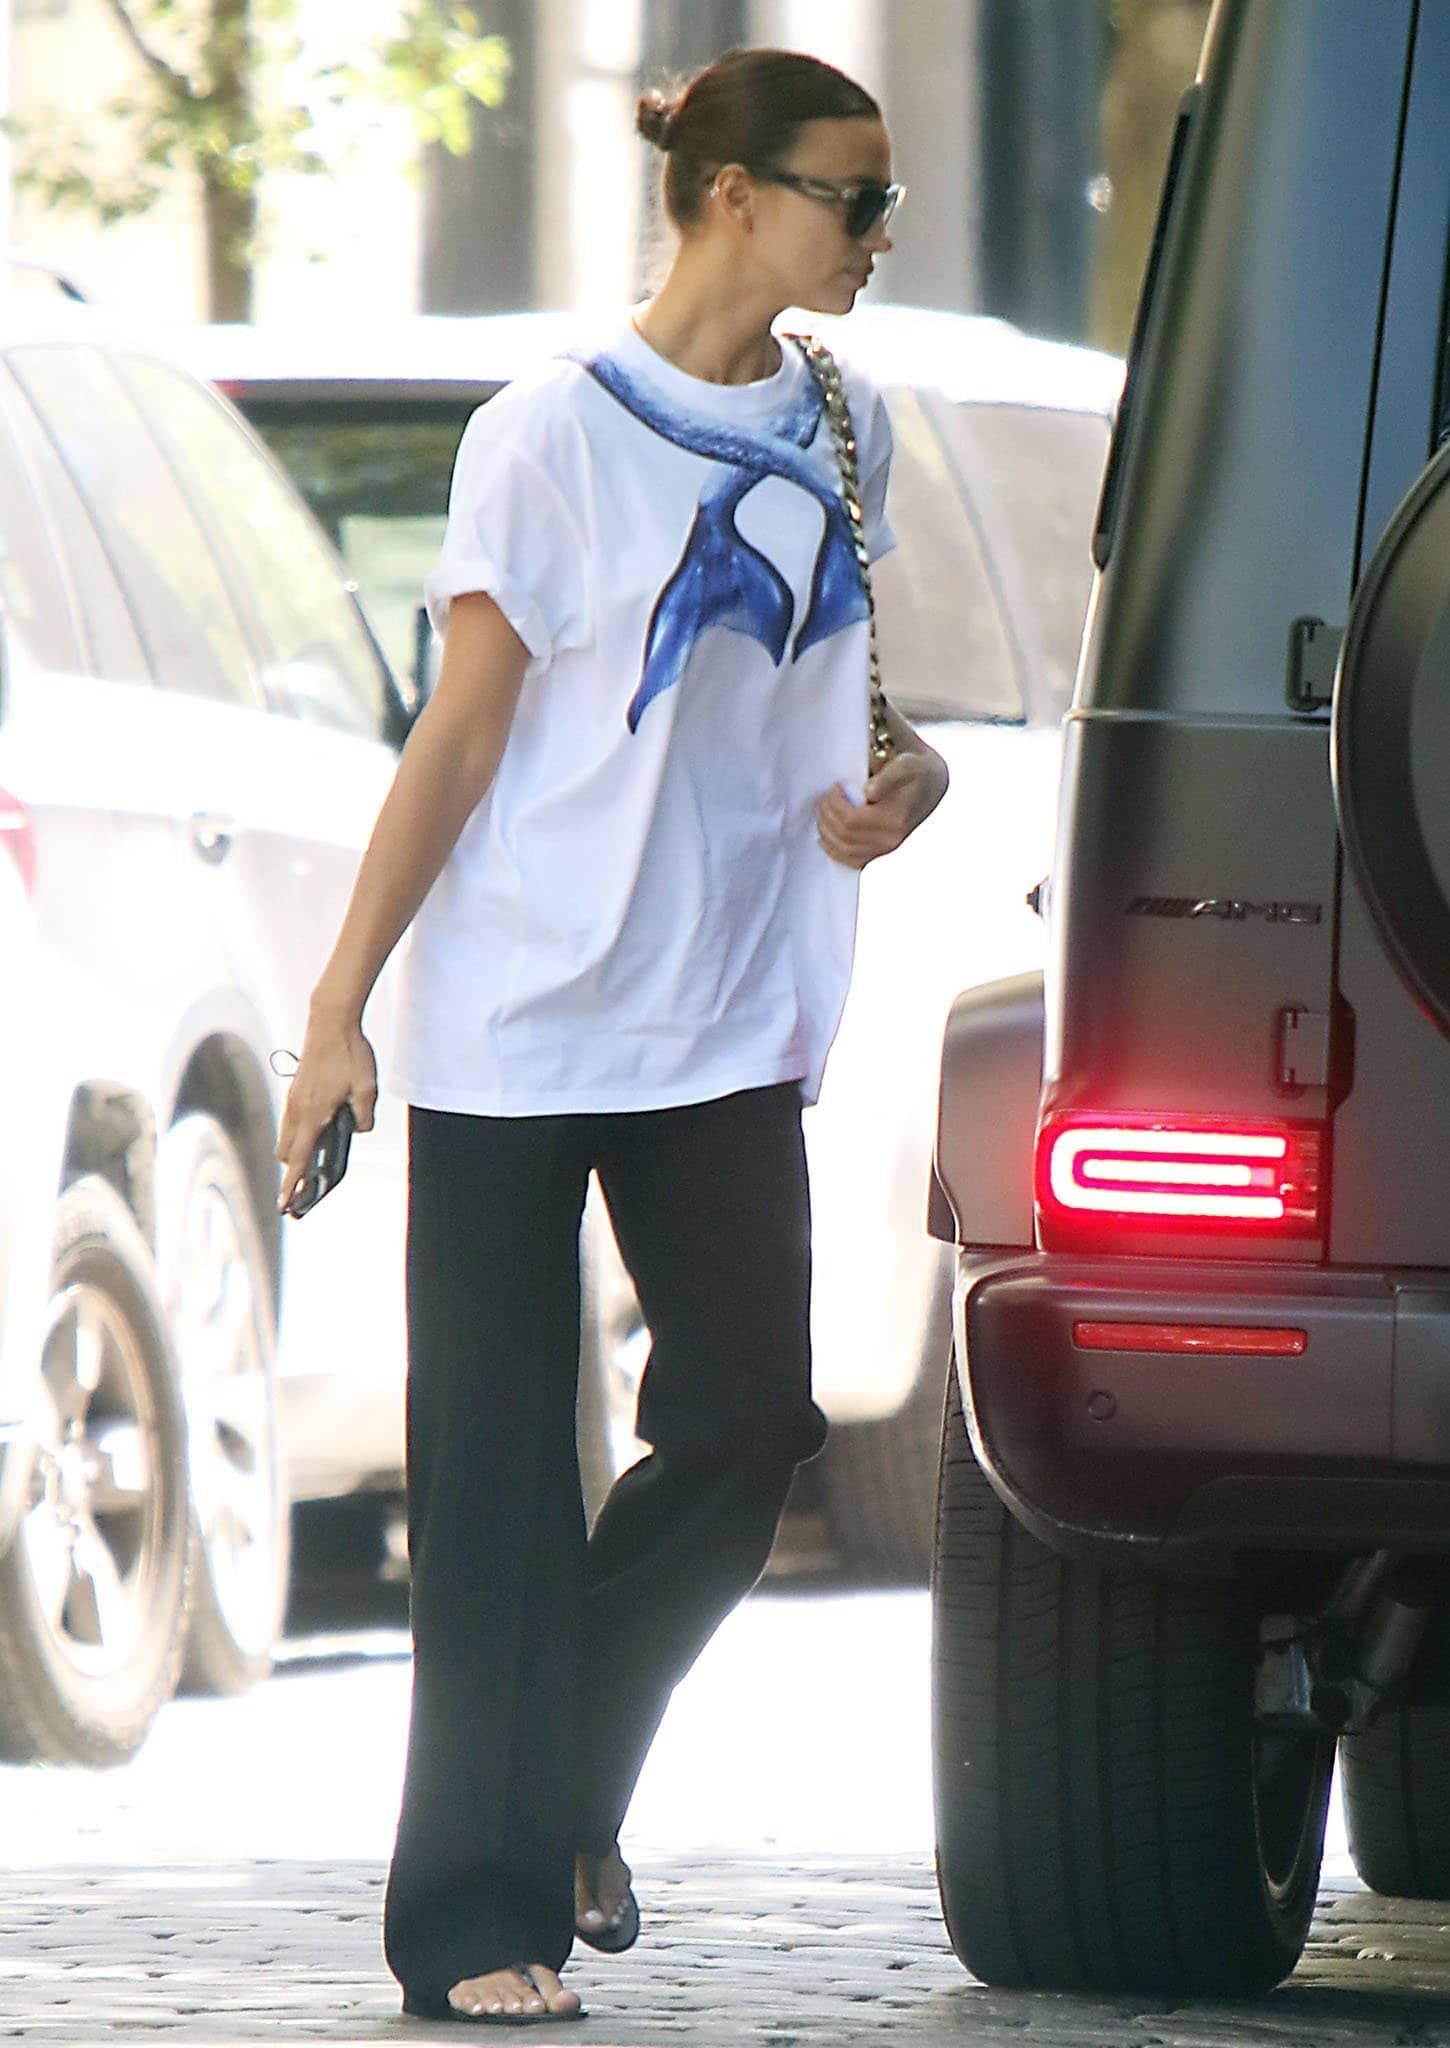 Irina Shayk keeps things casual in Burberry mermaid tail-print white tee and black pants